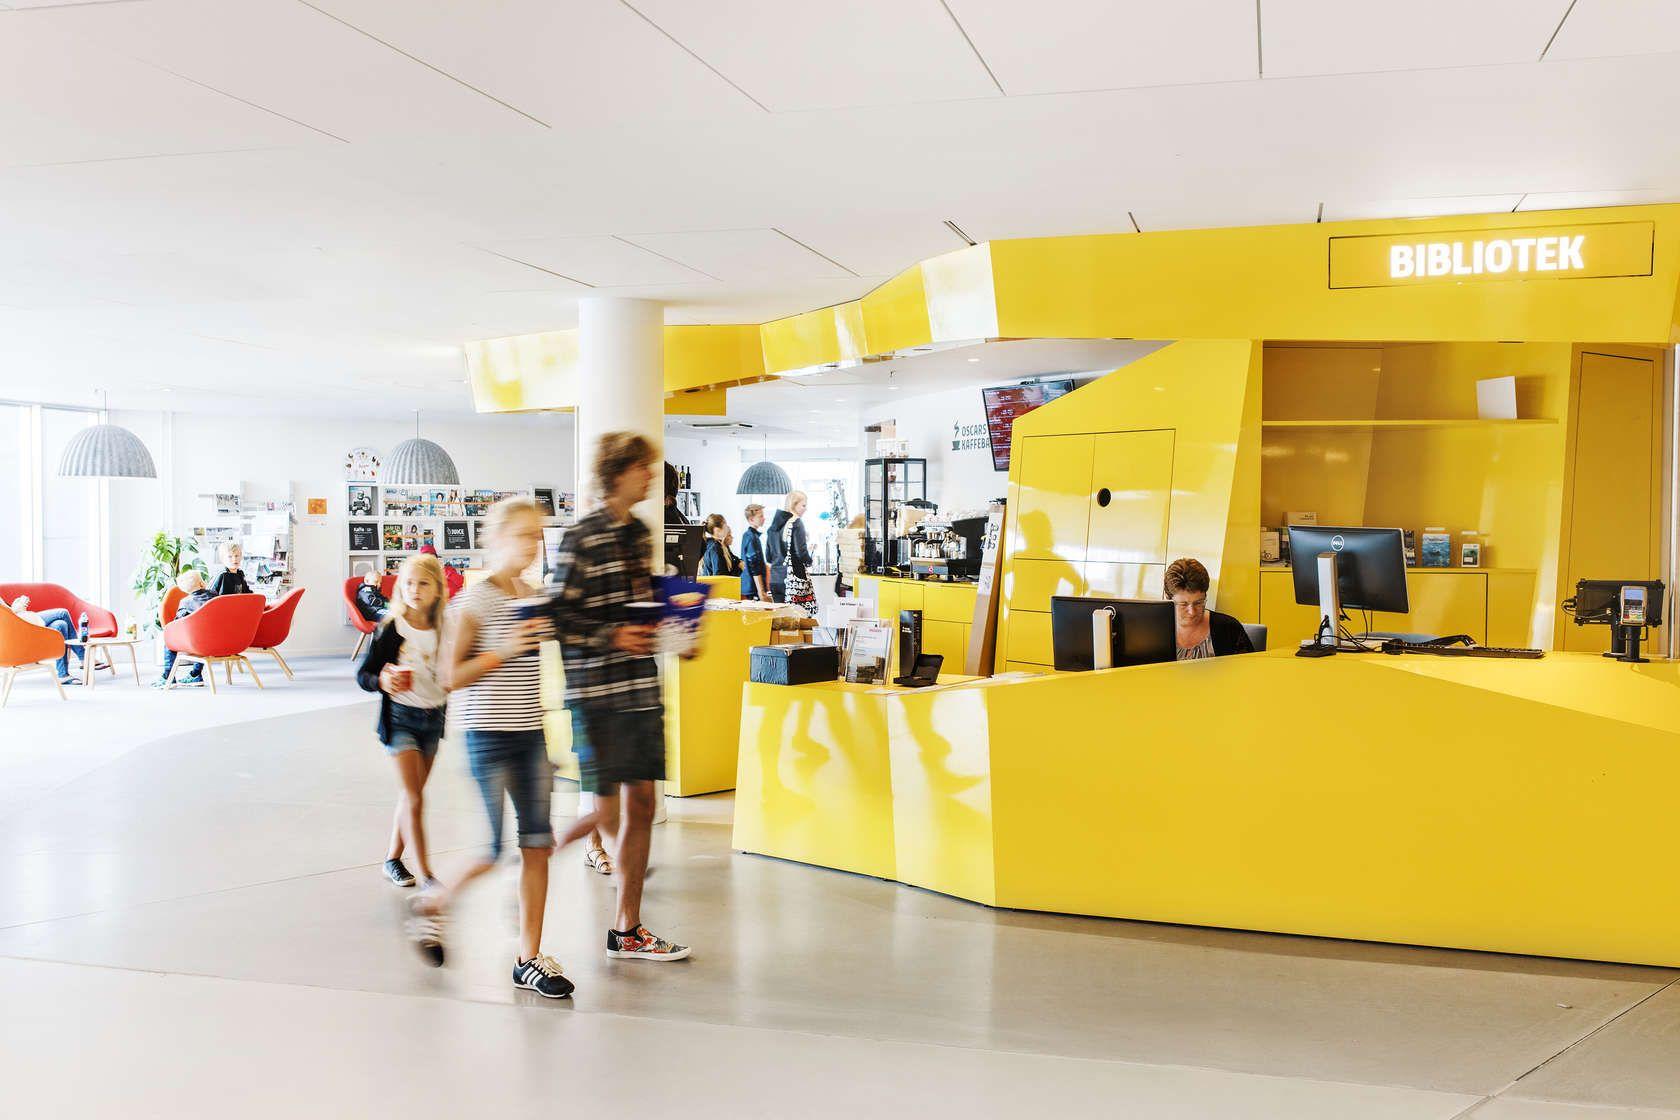 Rosan Bosch Studio has developed a unique interior designed to encourage and…